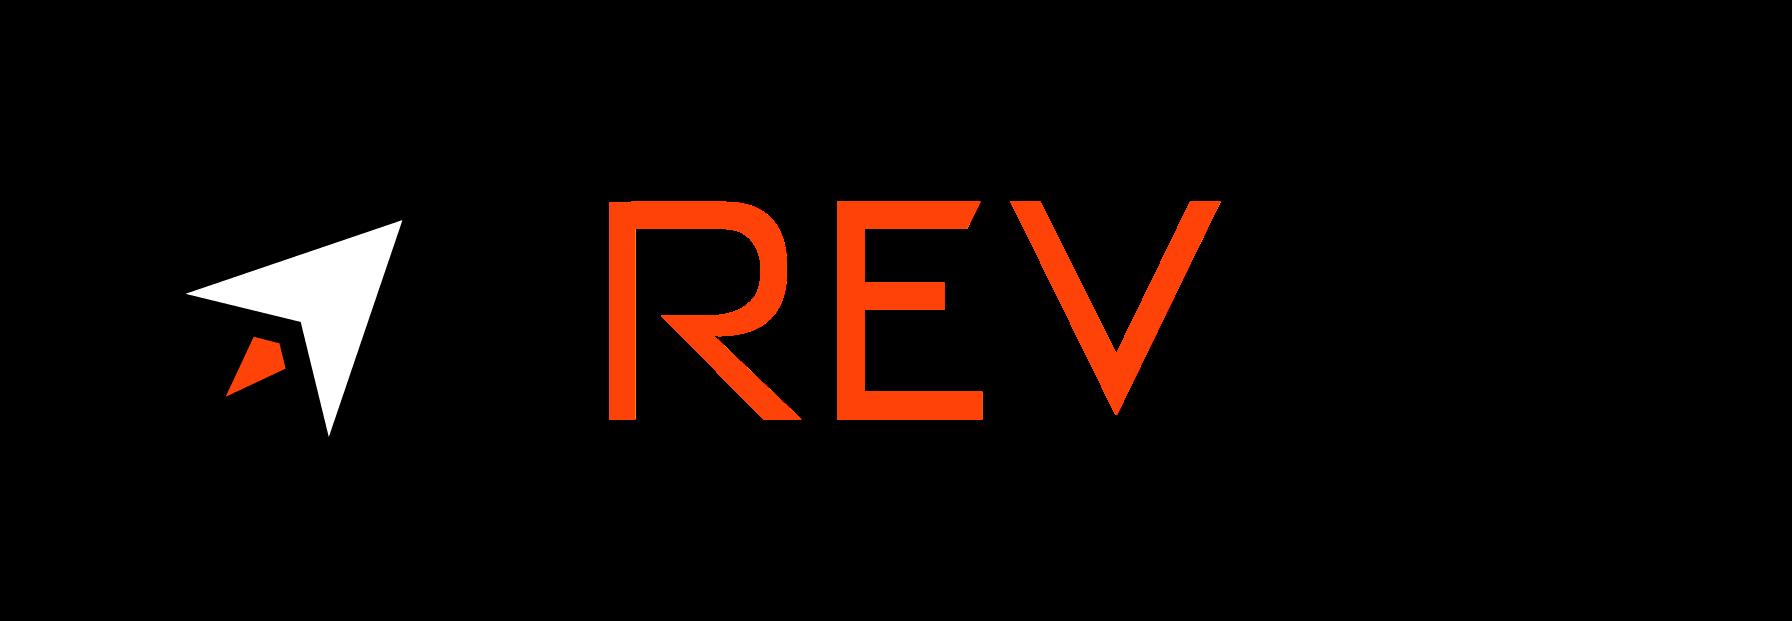 Revjet takes off